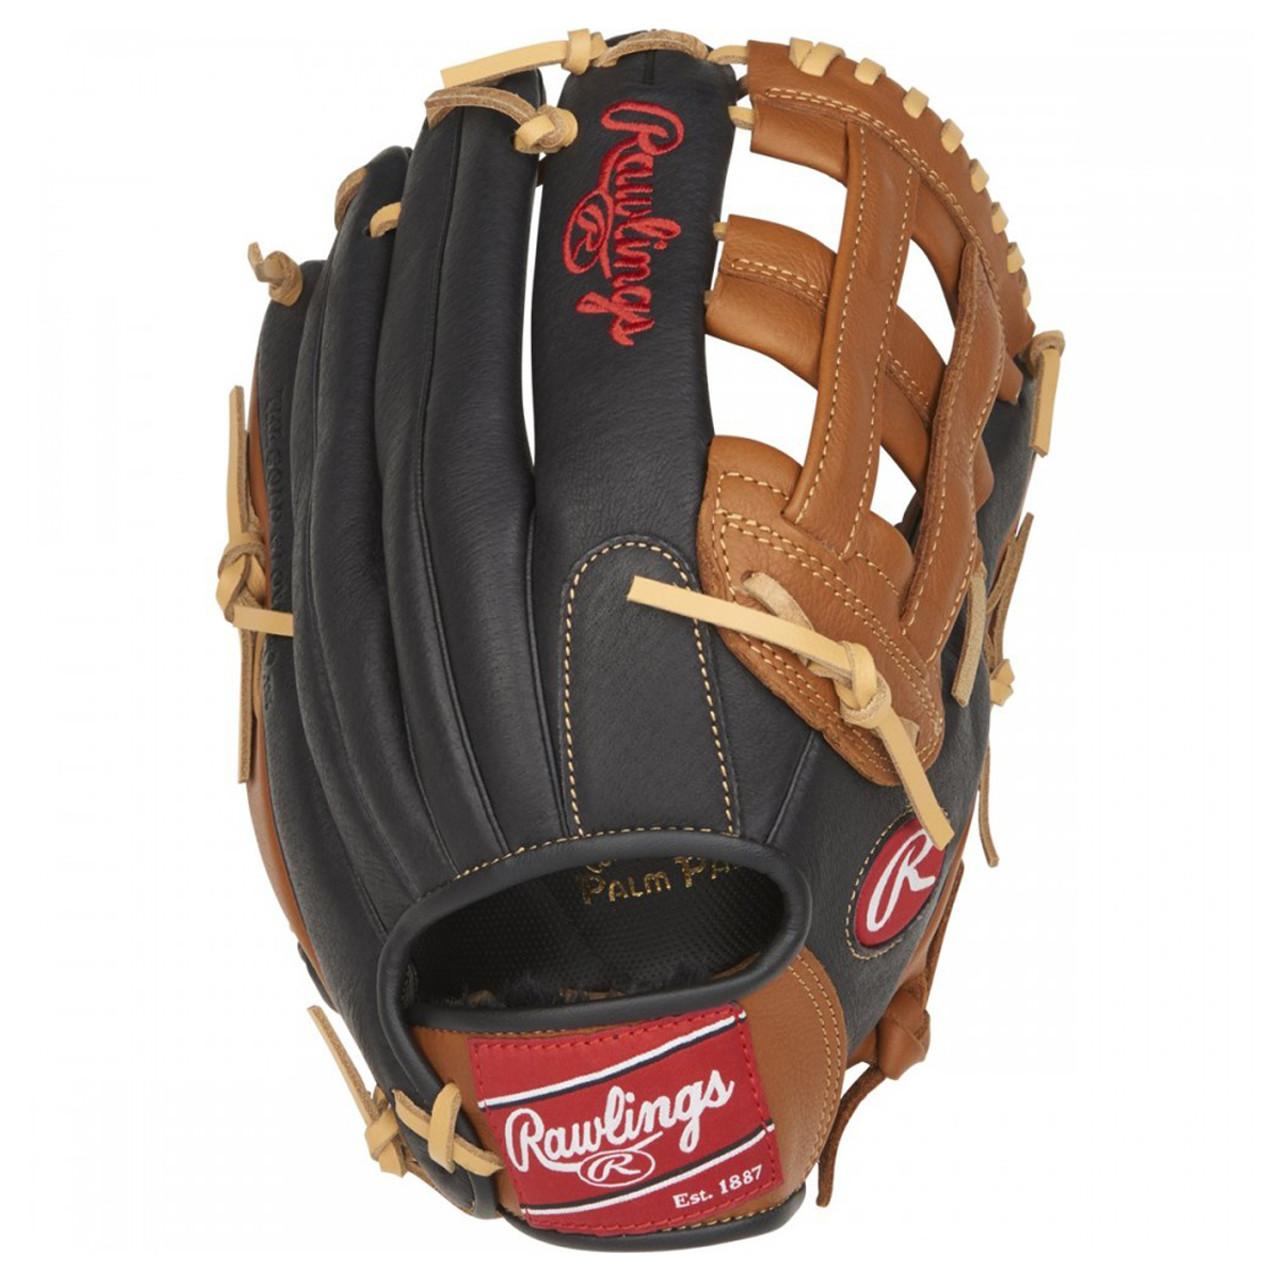 Black Rawlings Universal Protective Elbow Guard Adult Baseball Softball Gear